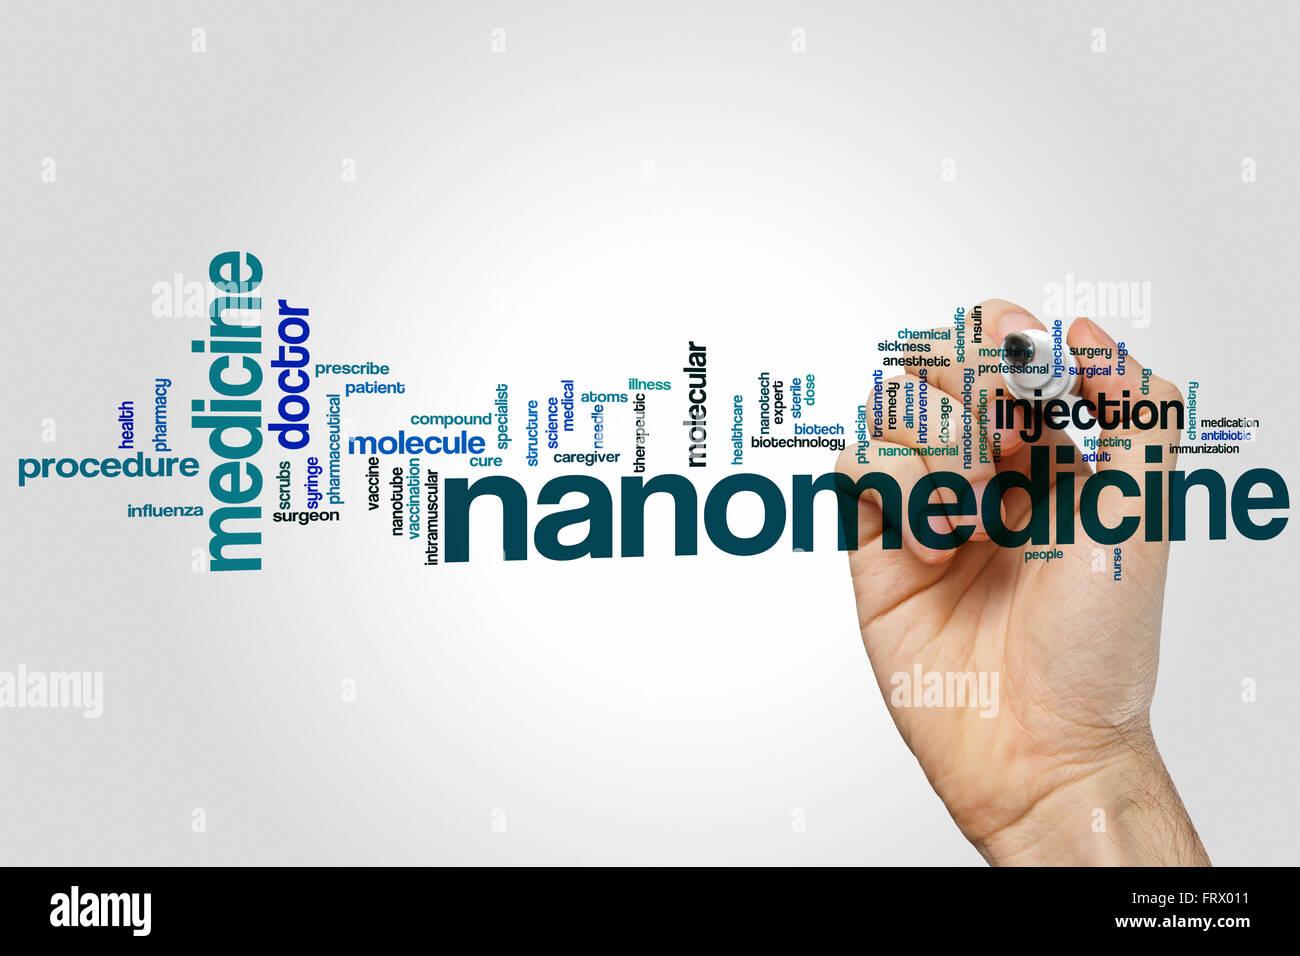 Nanomedicine word cloud concept - Stock Image